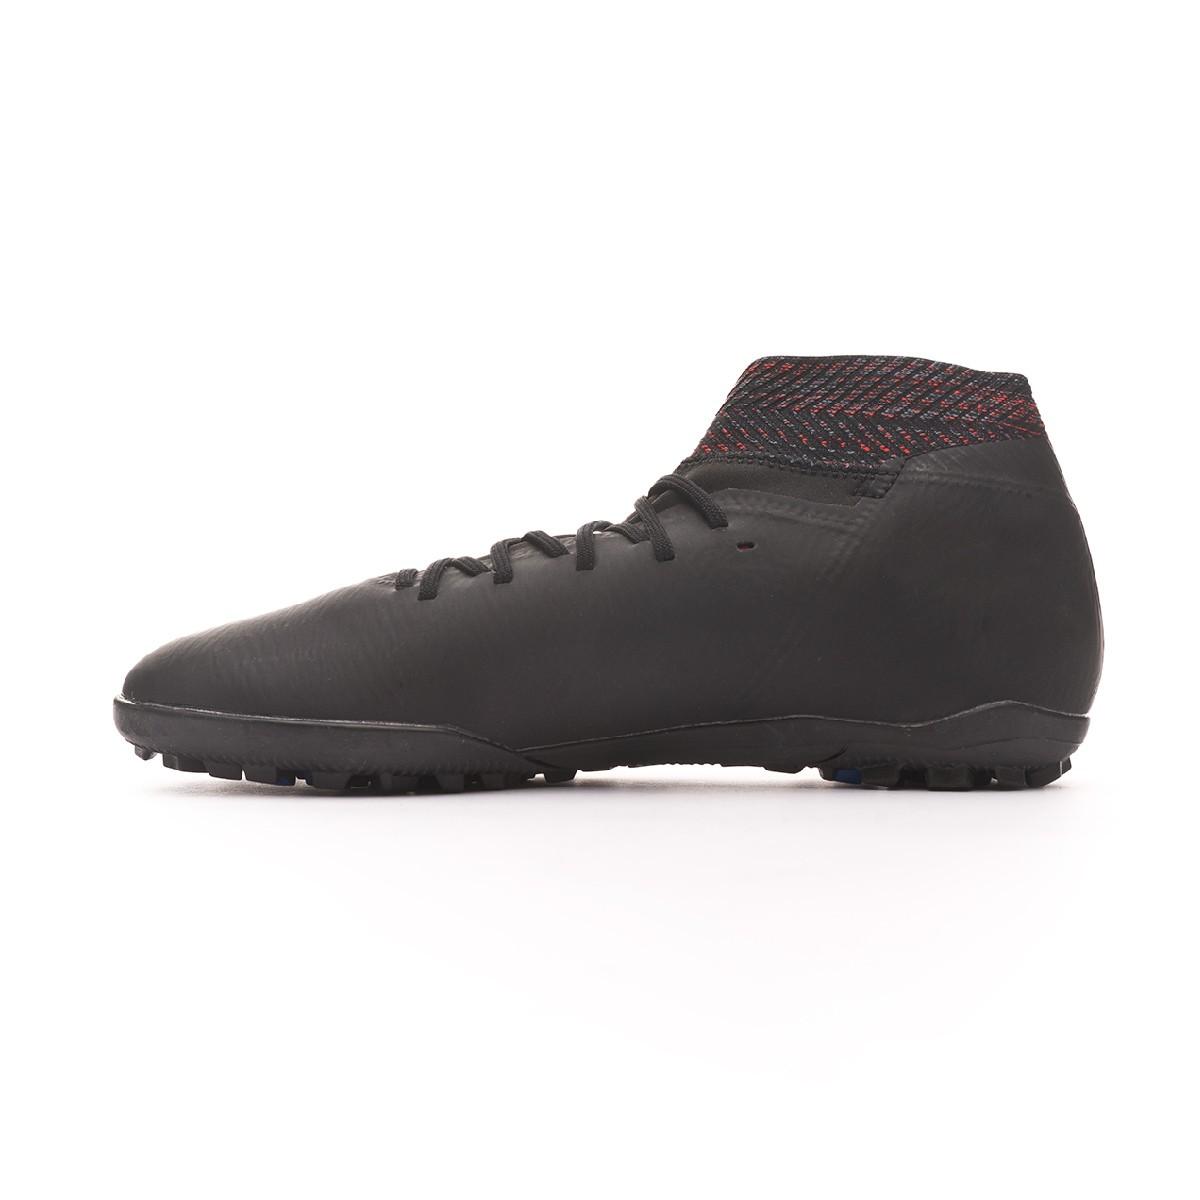 d86526e62 Football Boot adidas Nemeziz Tango 18.3 Turf Core black-Football blue -  Tienda de fútbol Fútbol Emotion